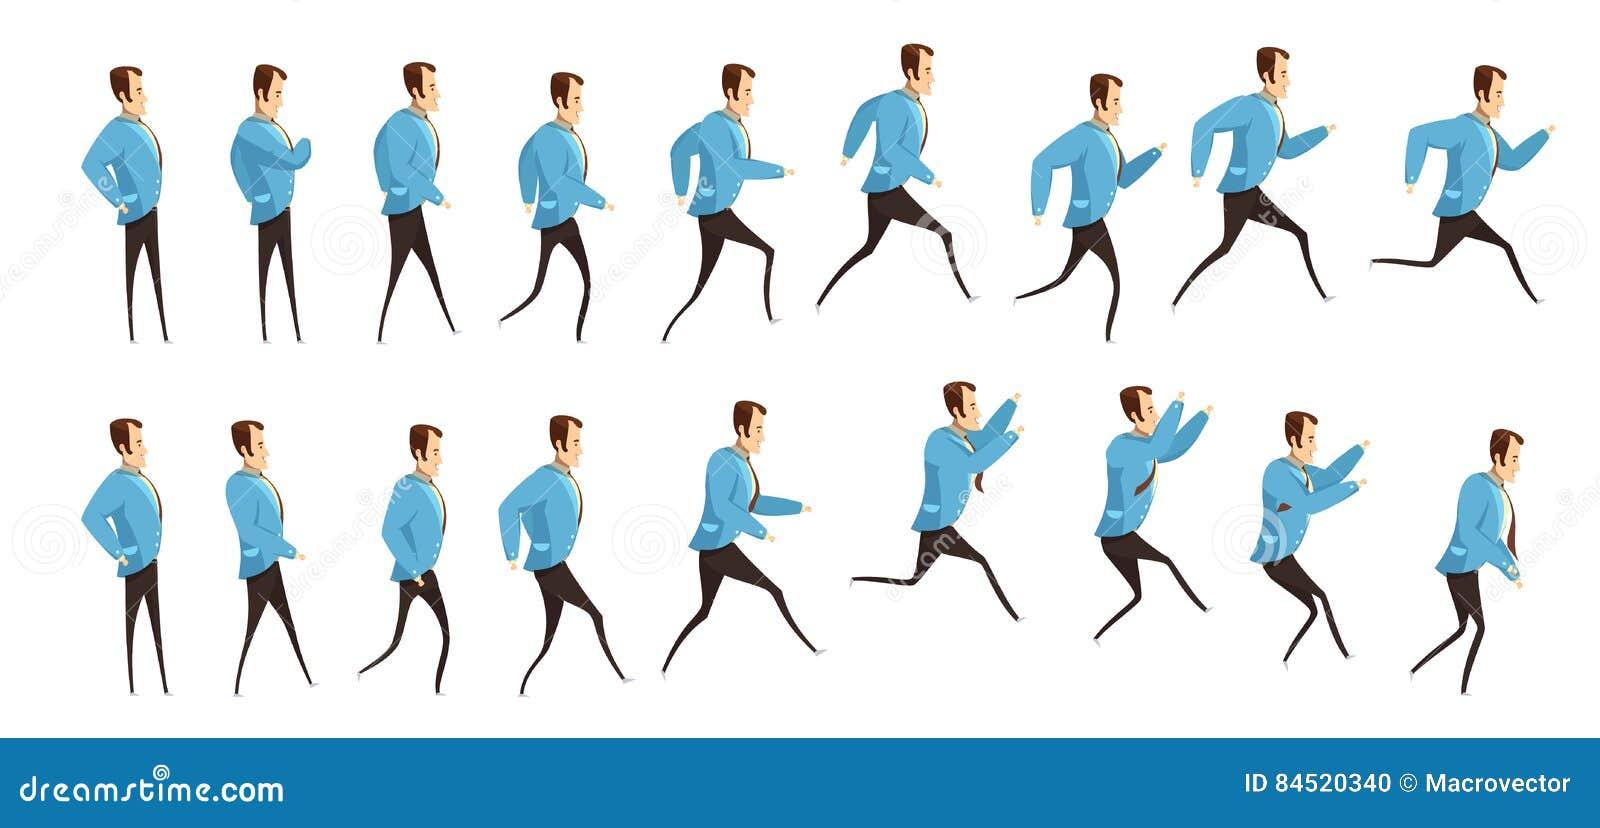 Running And Jumping Man Animation Stock Vector - Illustration of ...